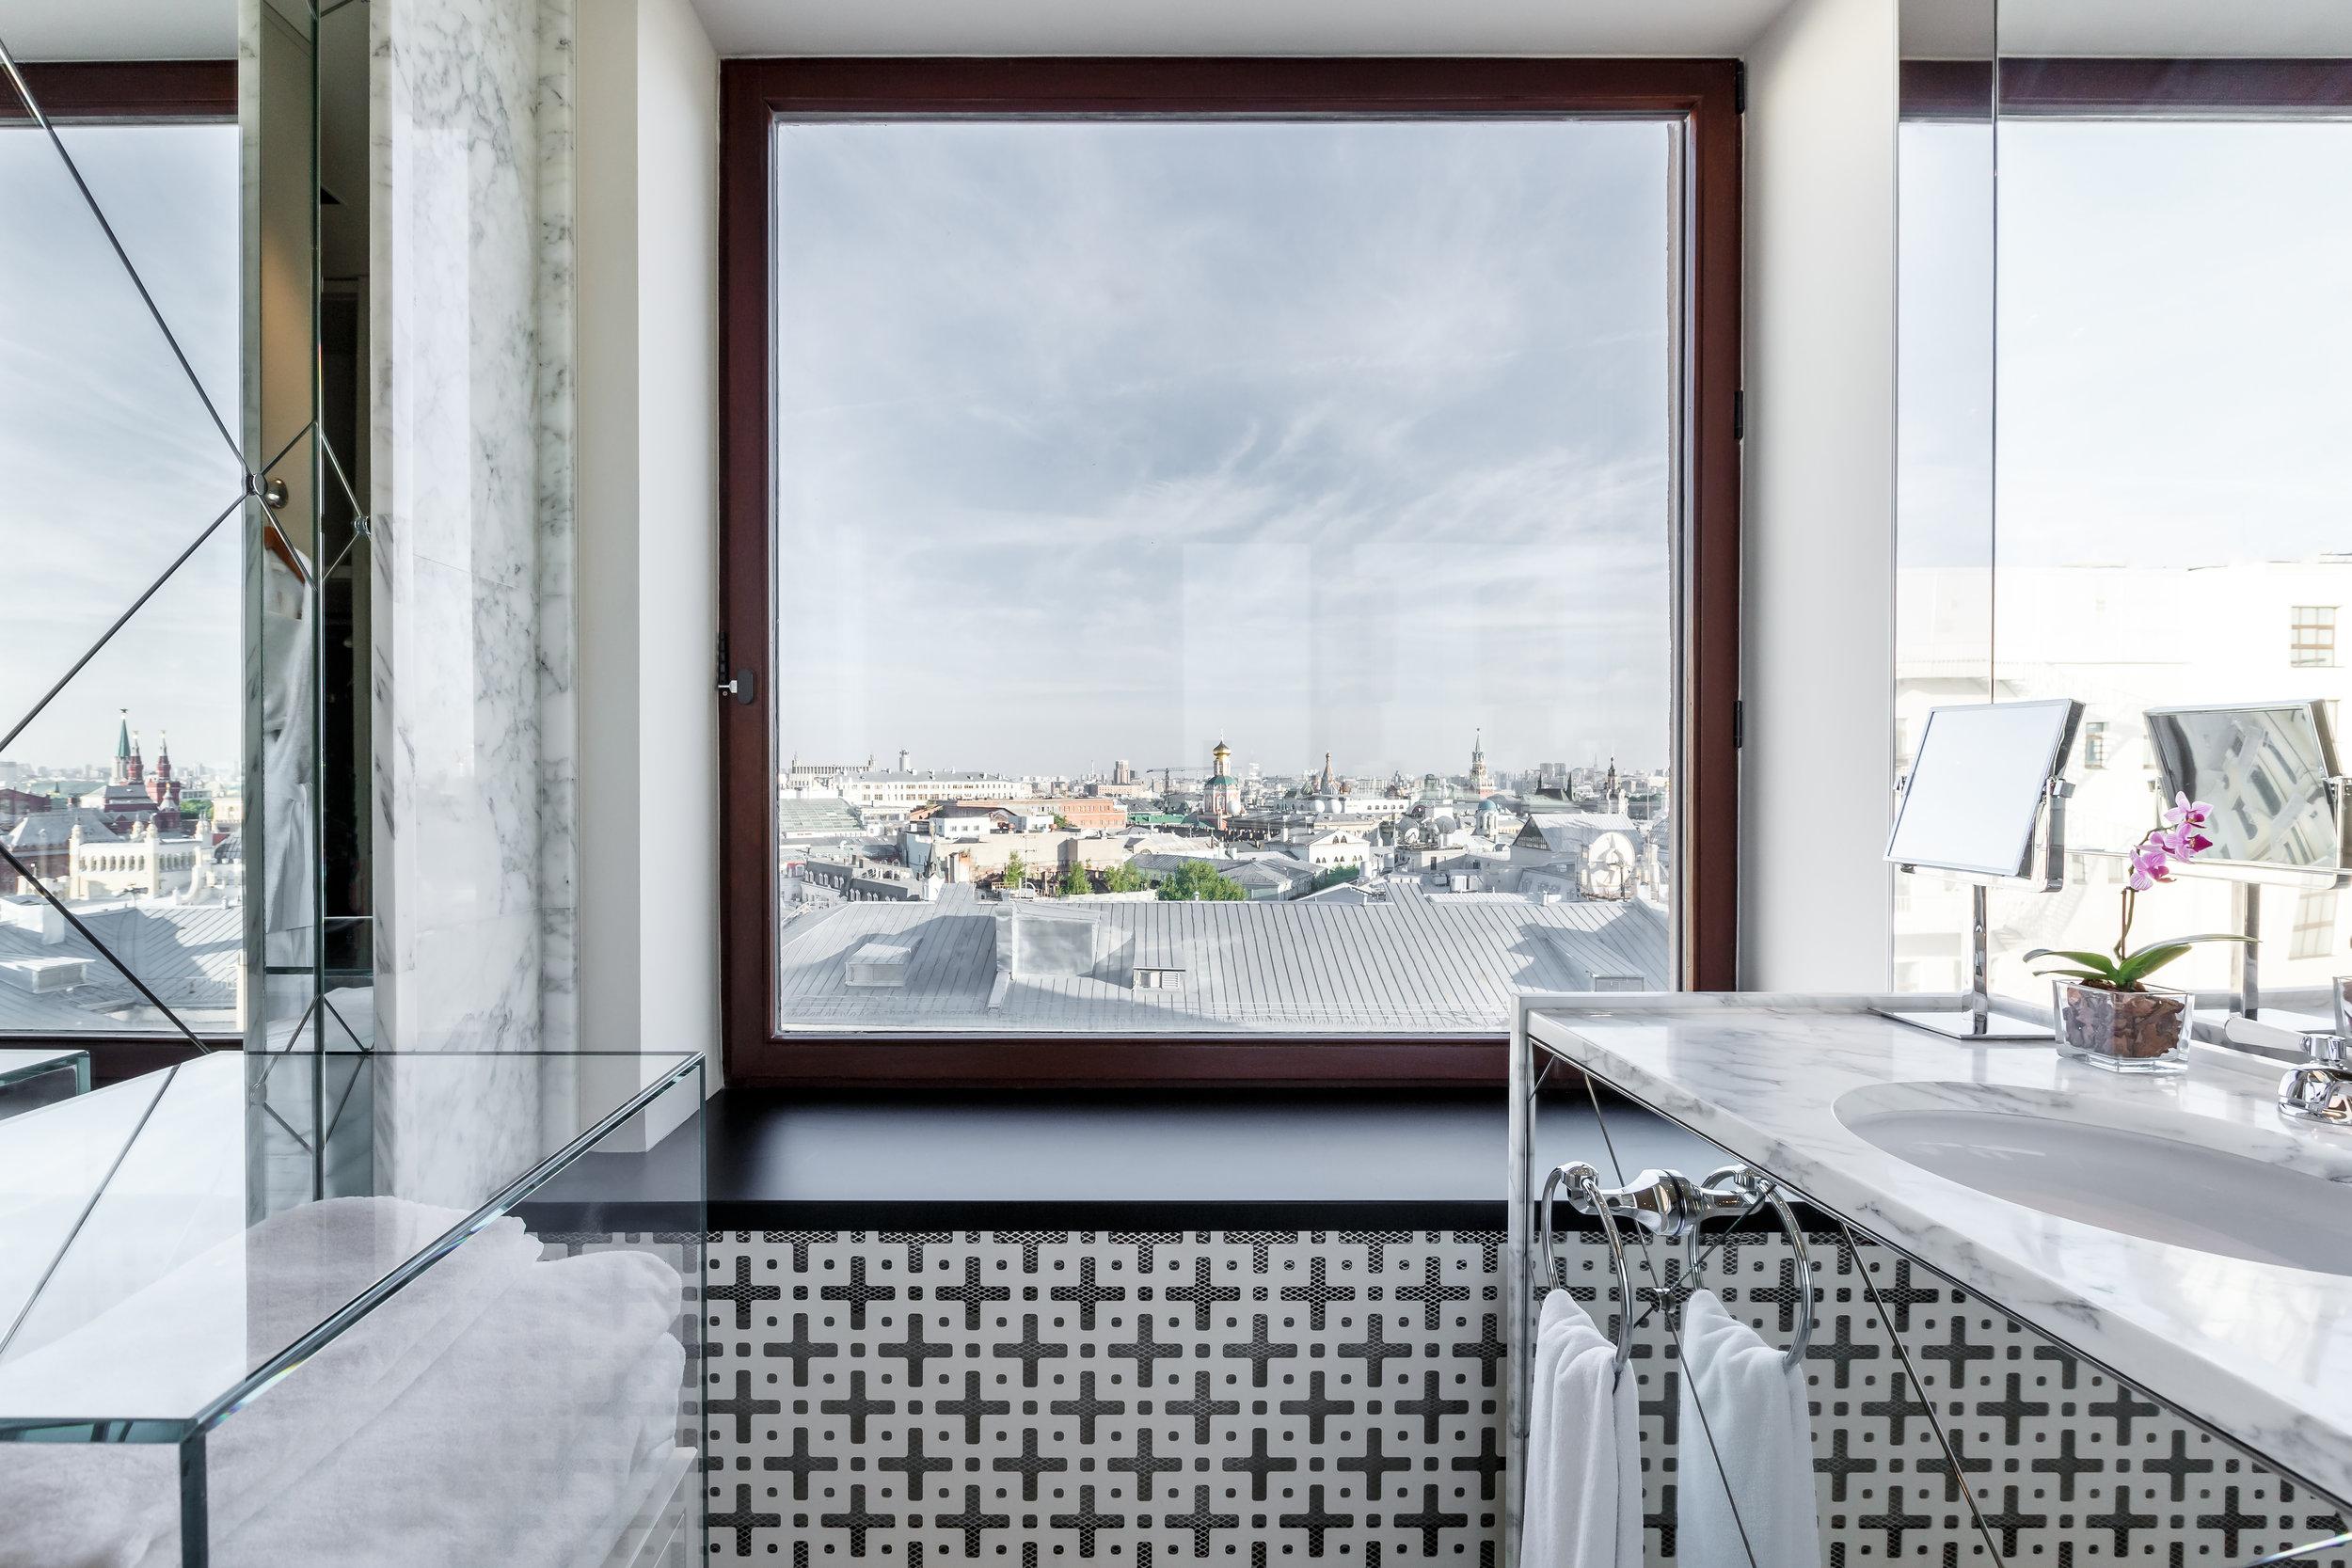 Ararat-Park-Hyatt-Moscow-Penthouse-Suite-Bathroom-Window.jpg